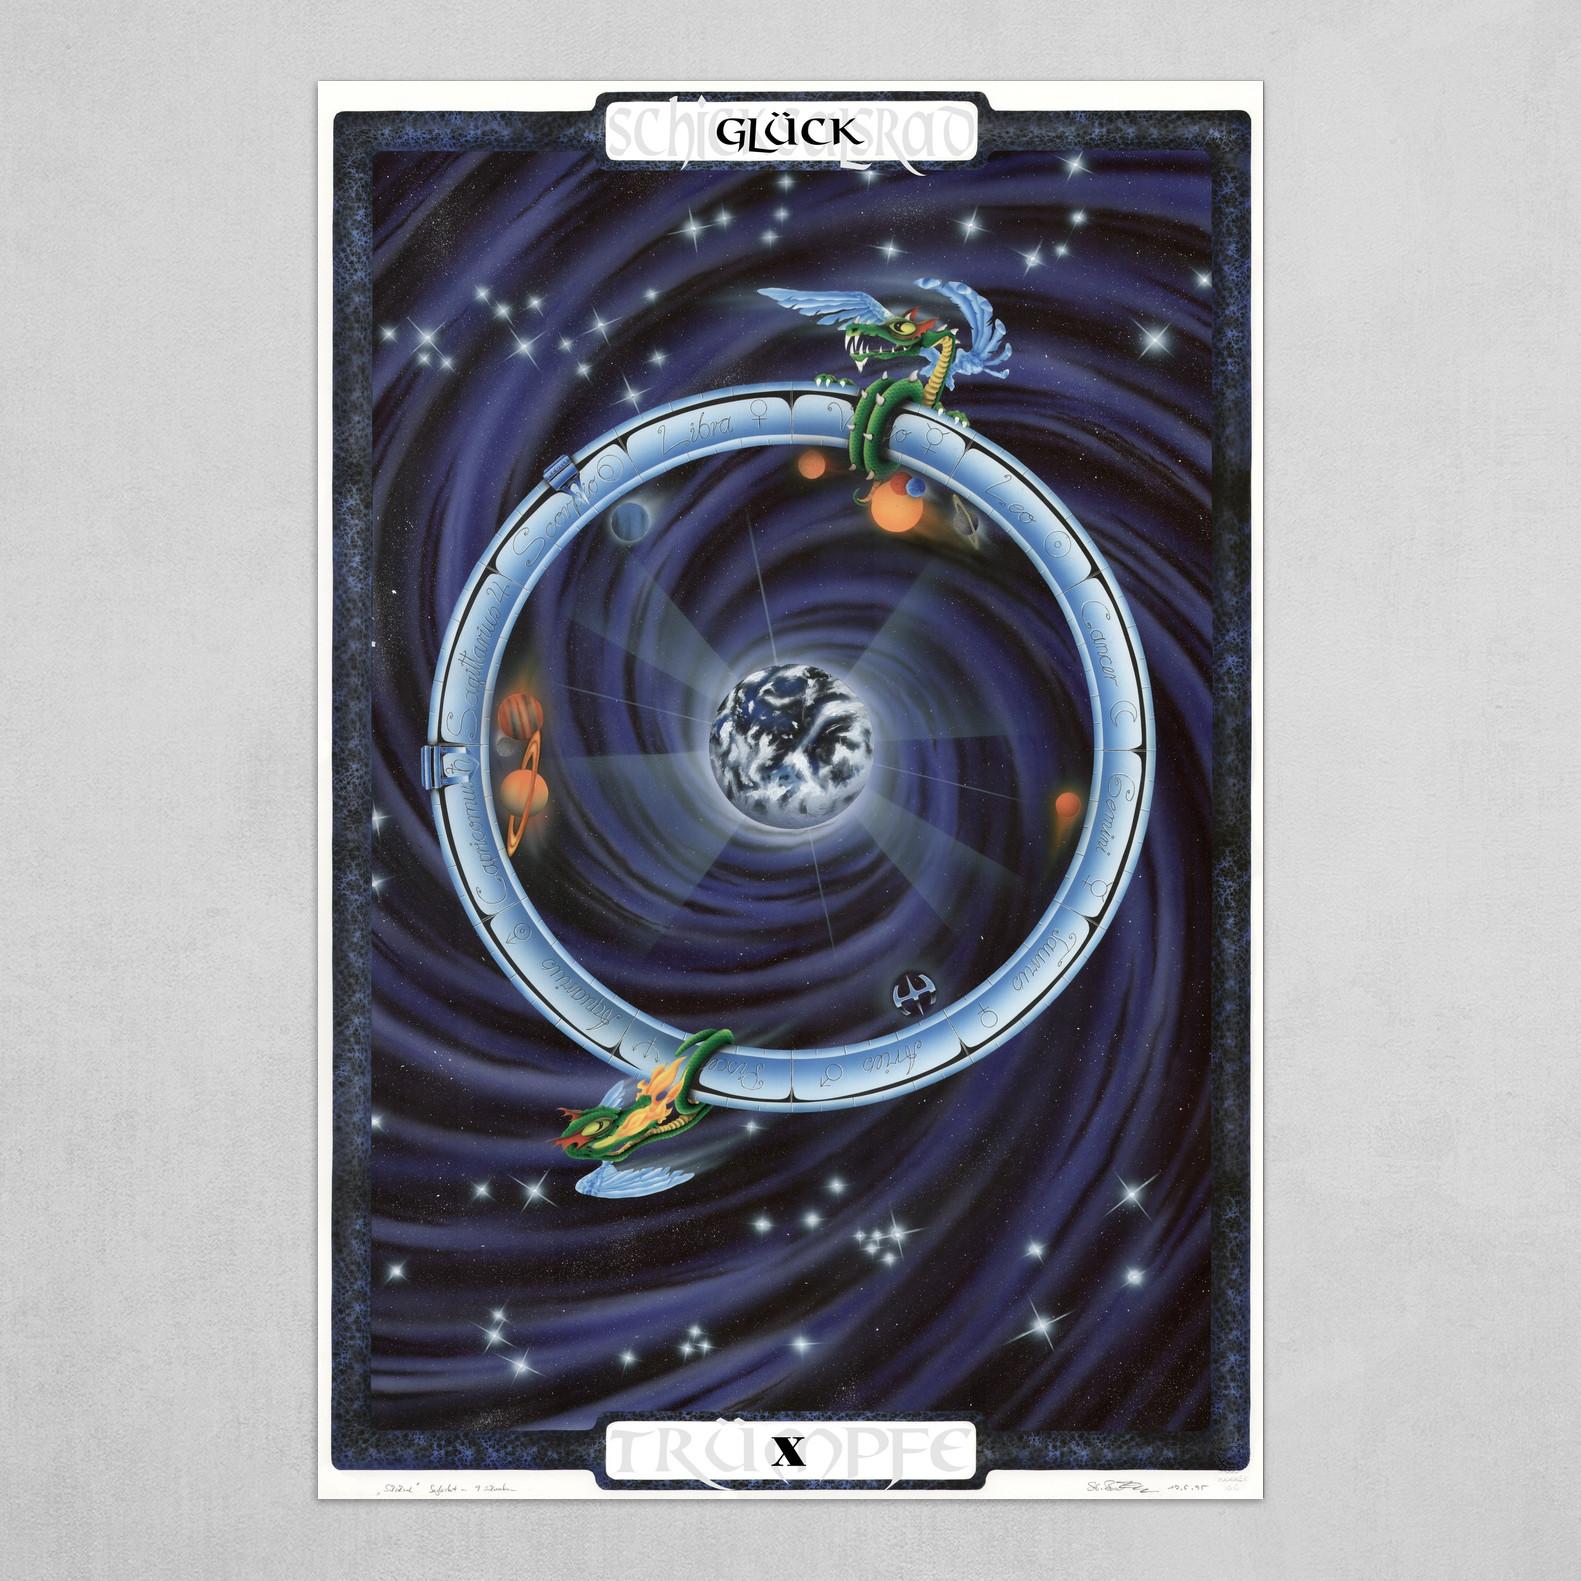 Glück - Wheel of Fortune